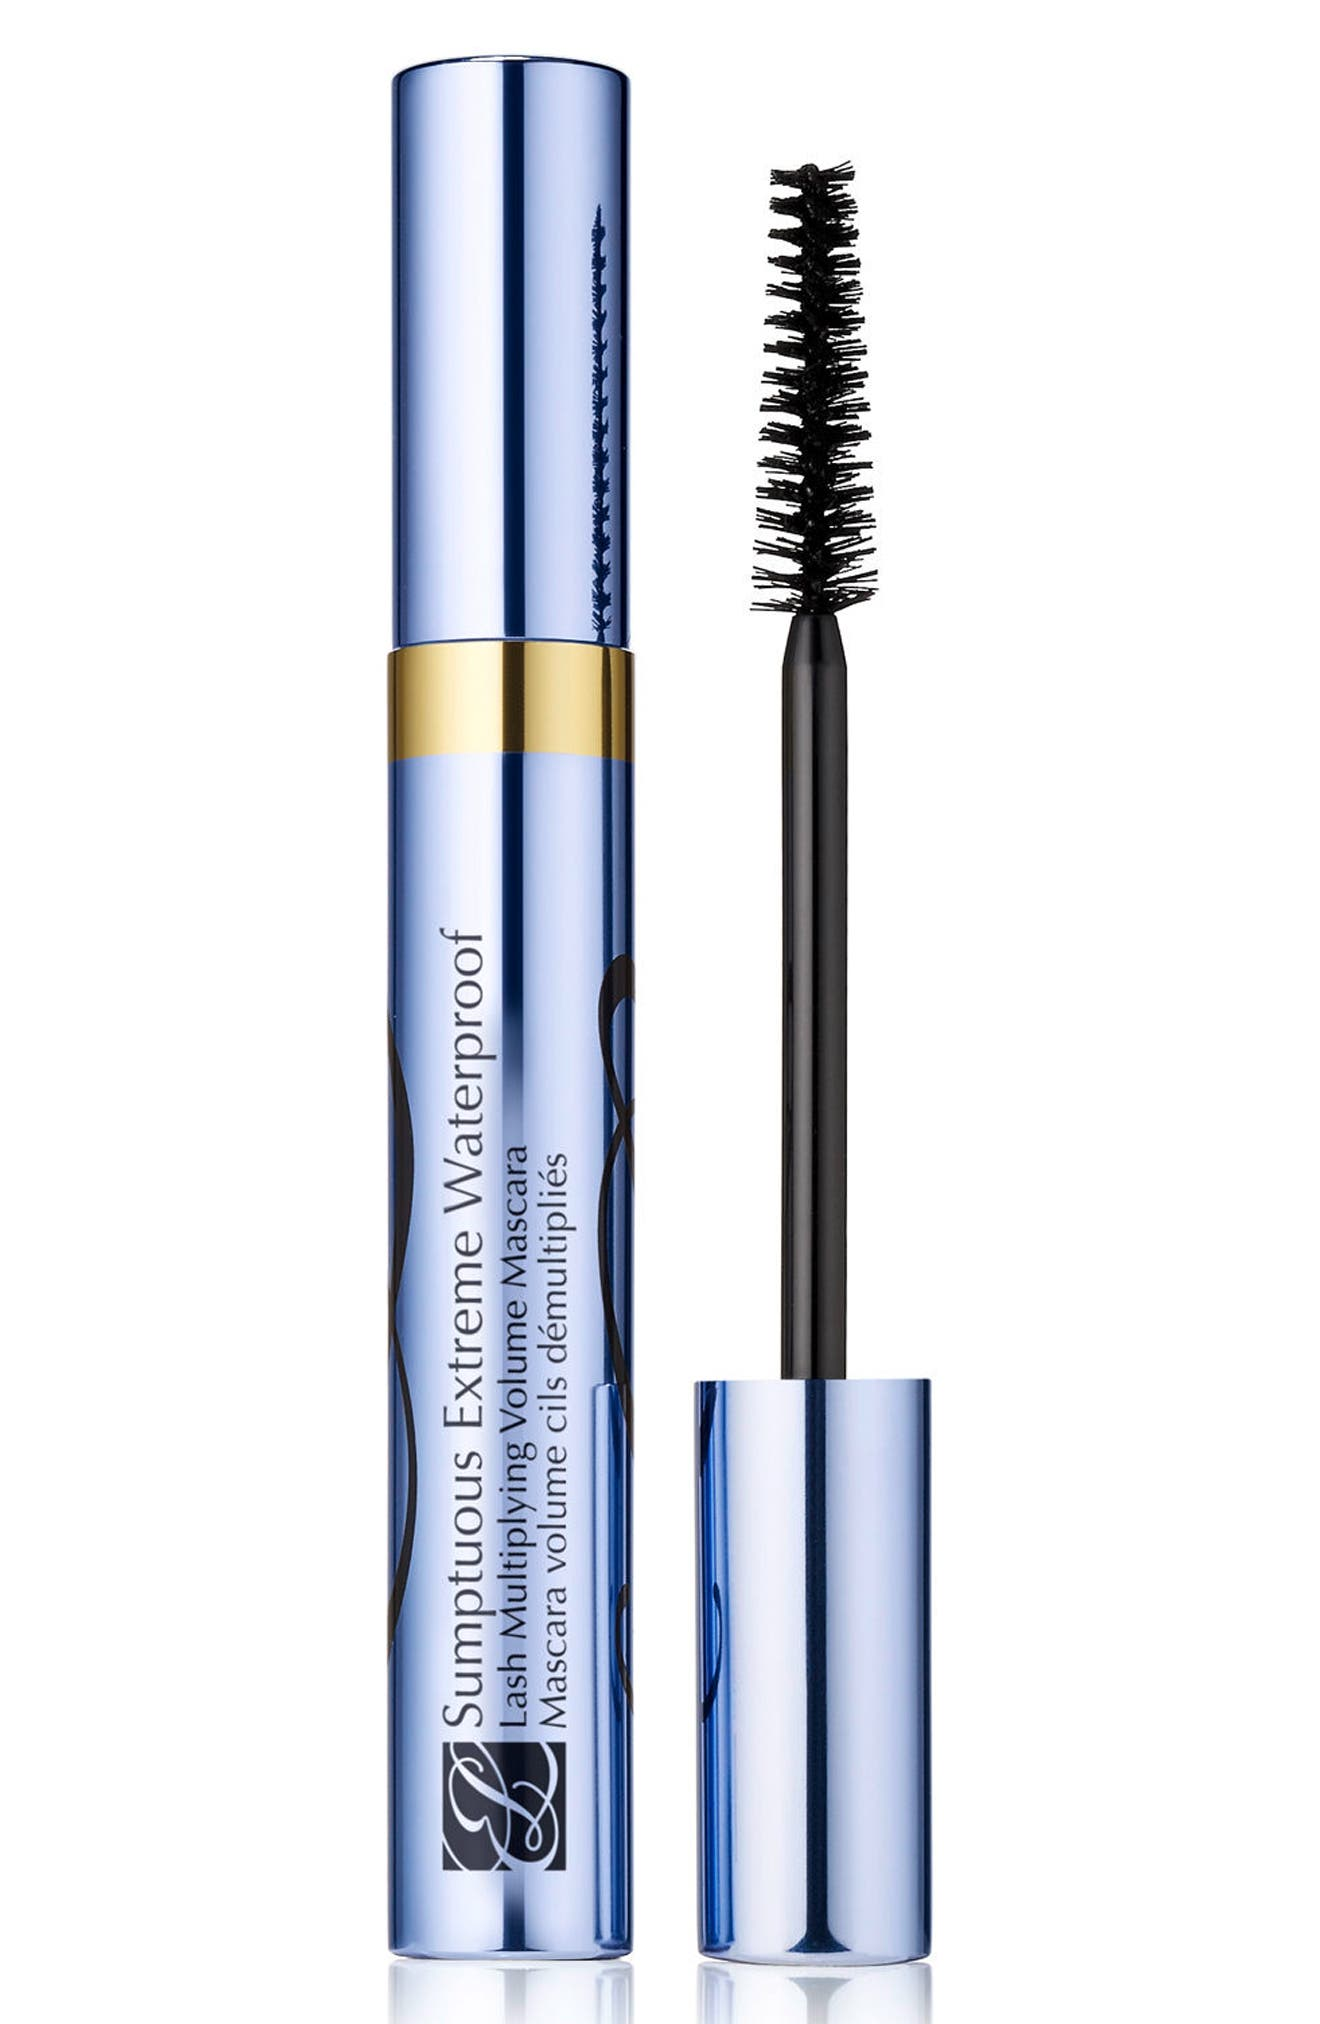 Sumptuous Extreme Waterproof Lash Multiplying Volume Mascara,                             Main thumbnail 1, color,                             EXTREME BLACK